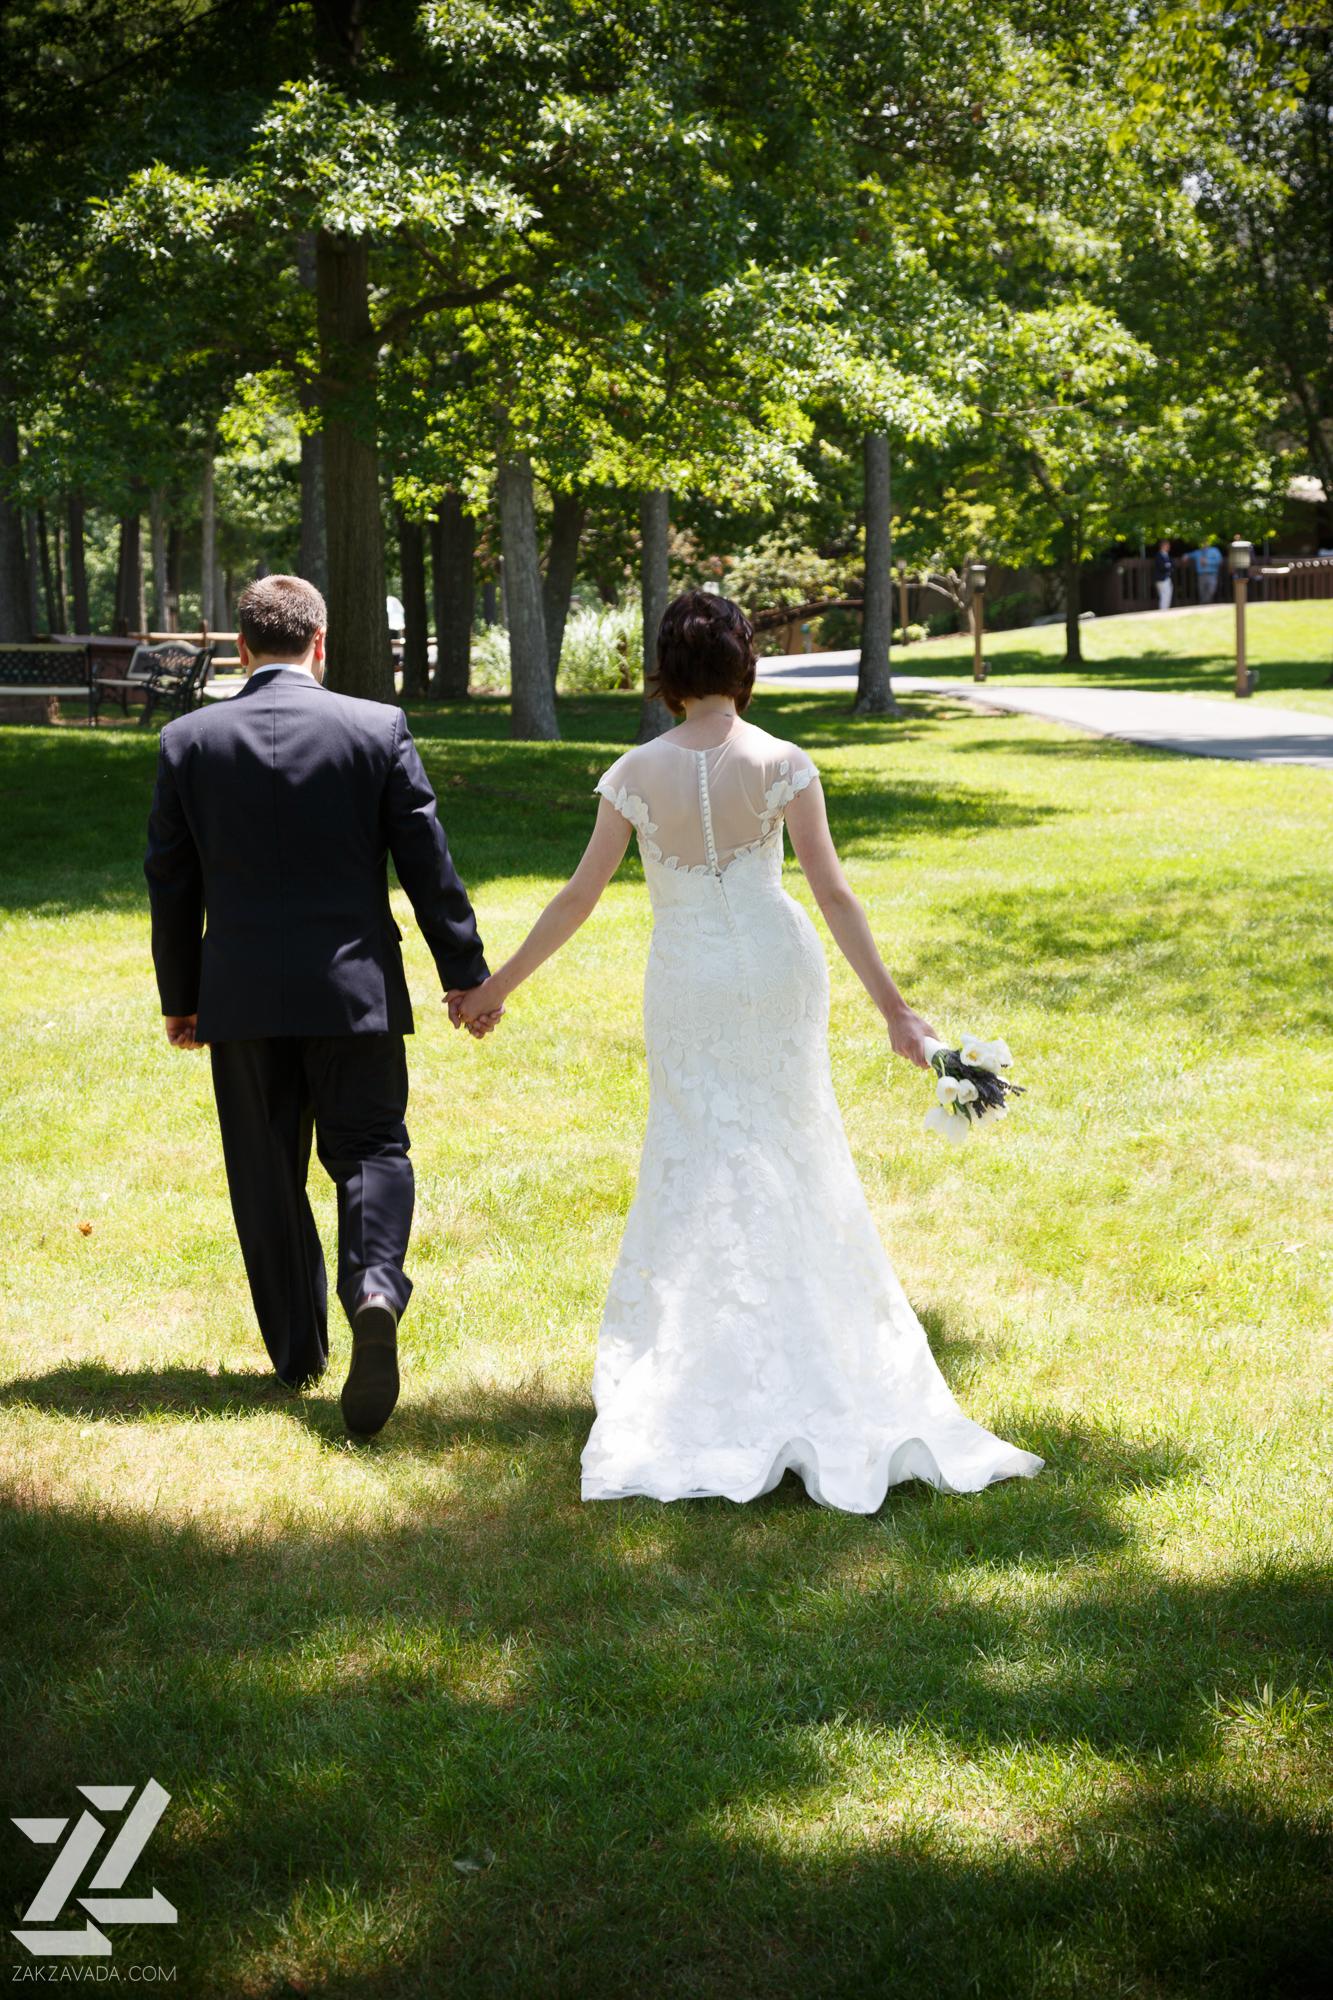 scranton-wedding-photography-zak-zavada-ruddyBelcastroWedding-643.jpg